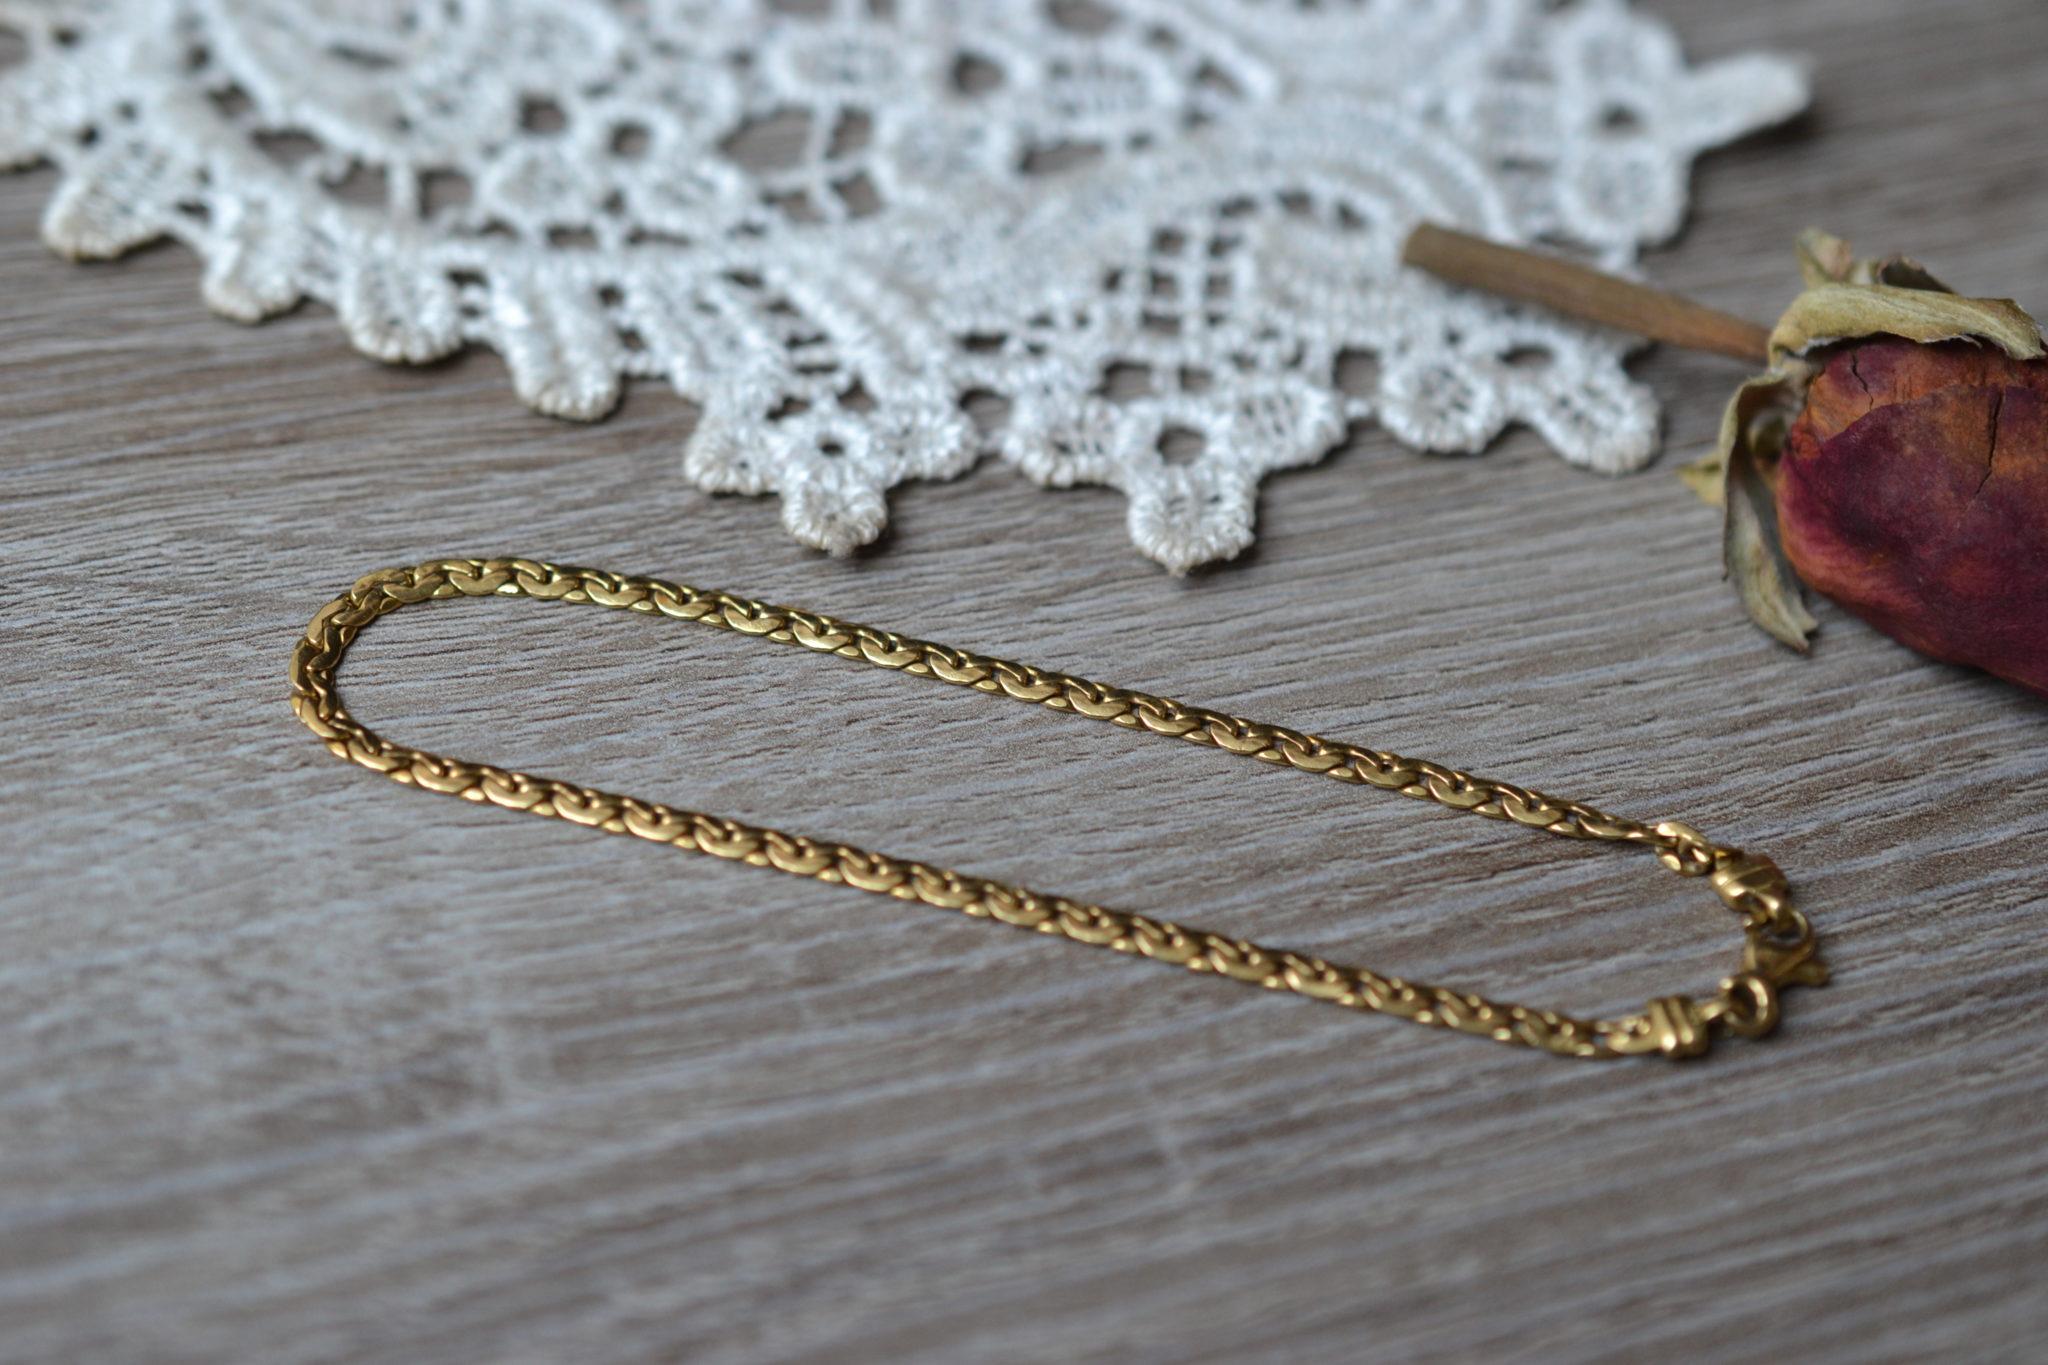 Bracelet Maille En Or Jaune Unisexe Bijou Seconde Main